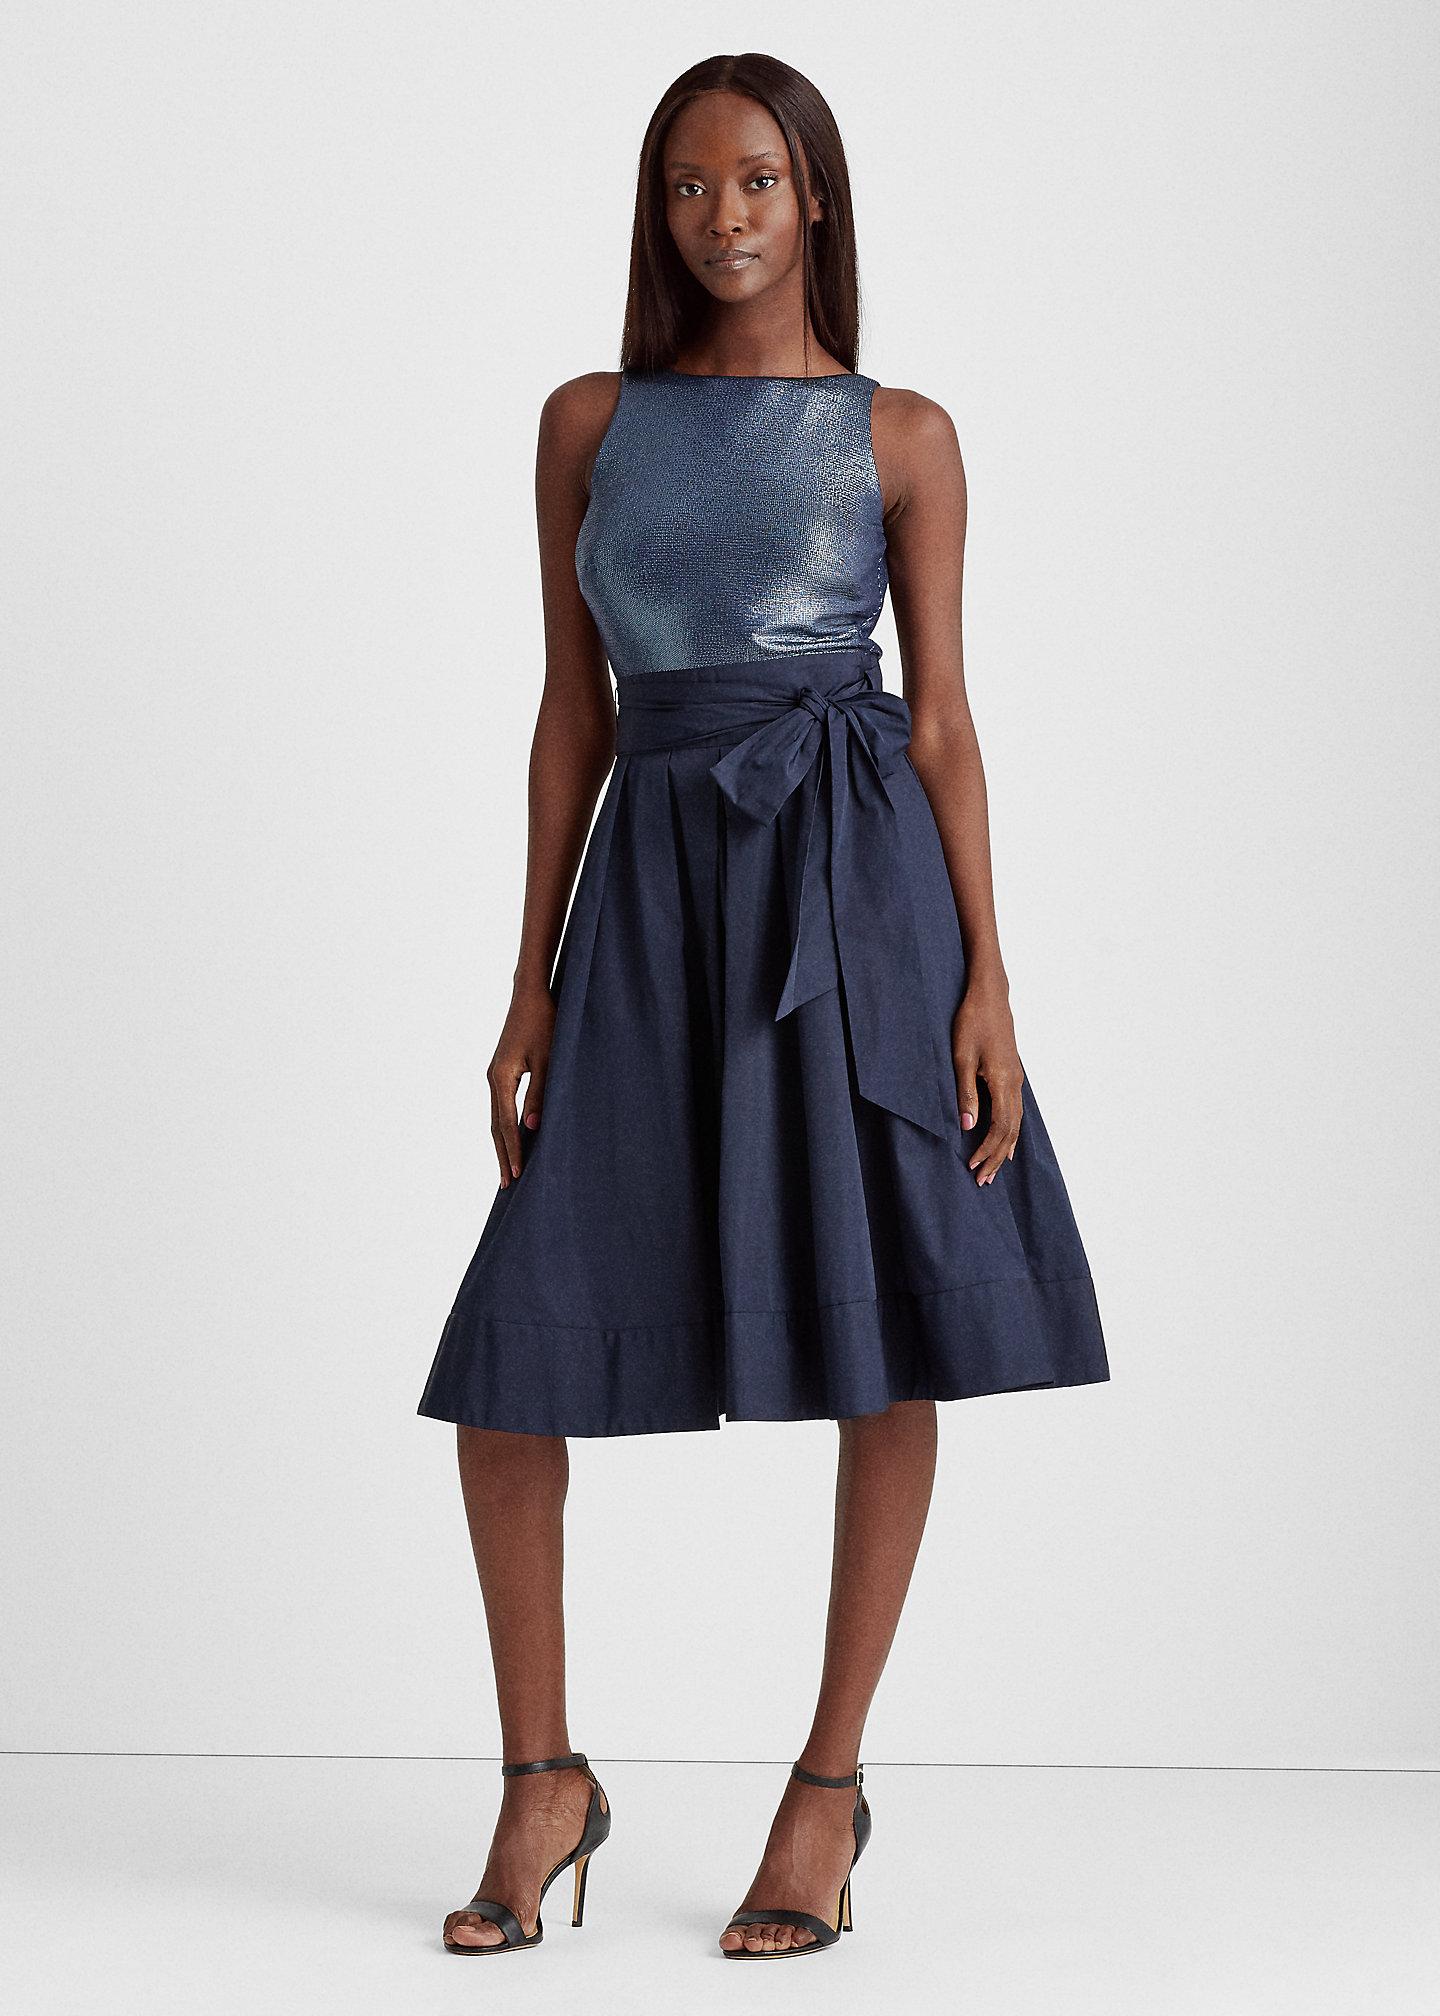 Lauren Sleeveless Taffeta Dress